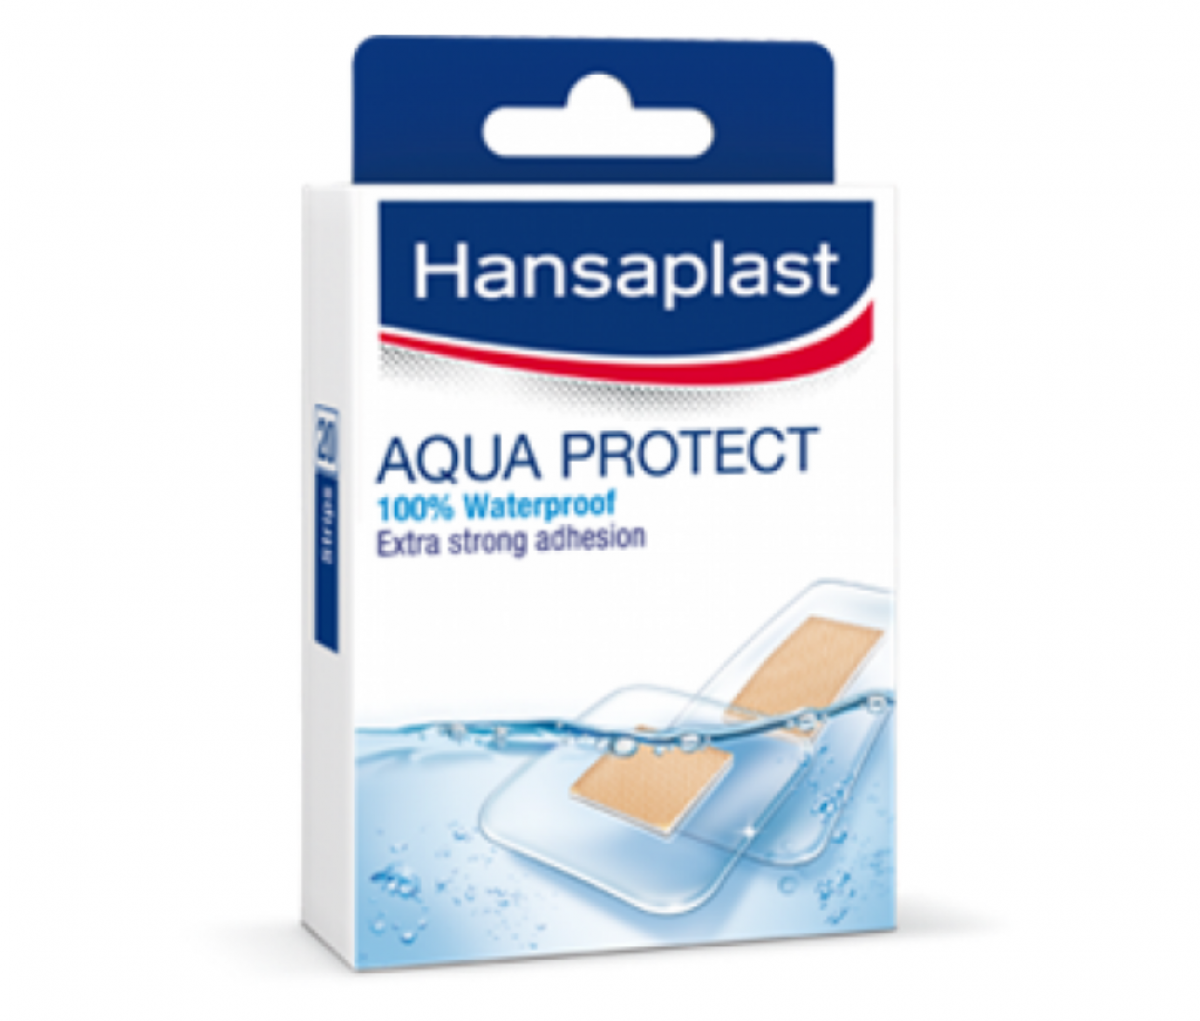 Hansaplast Waterproof Plaster